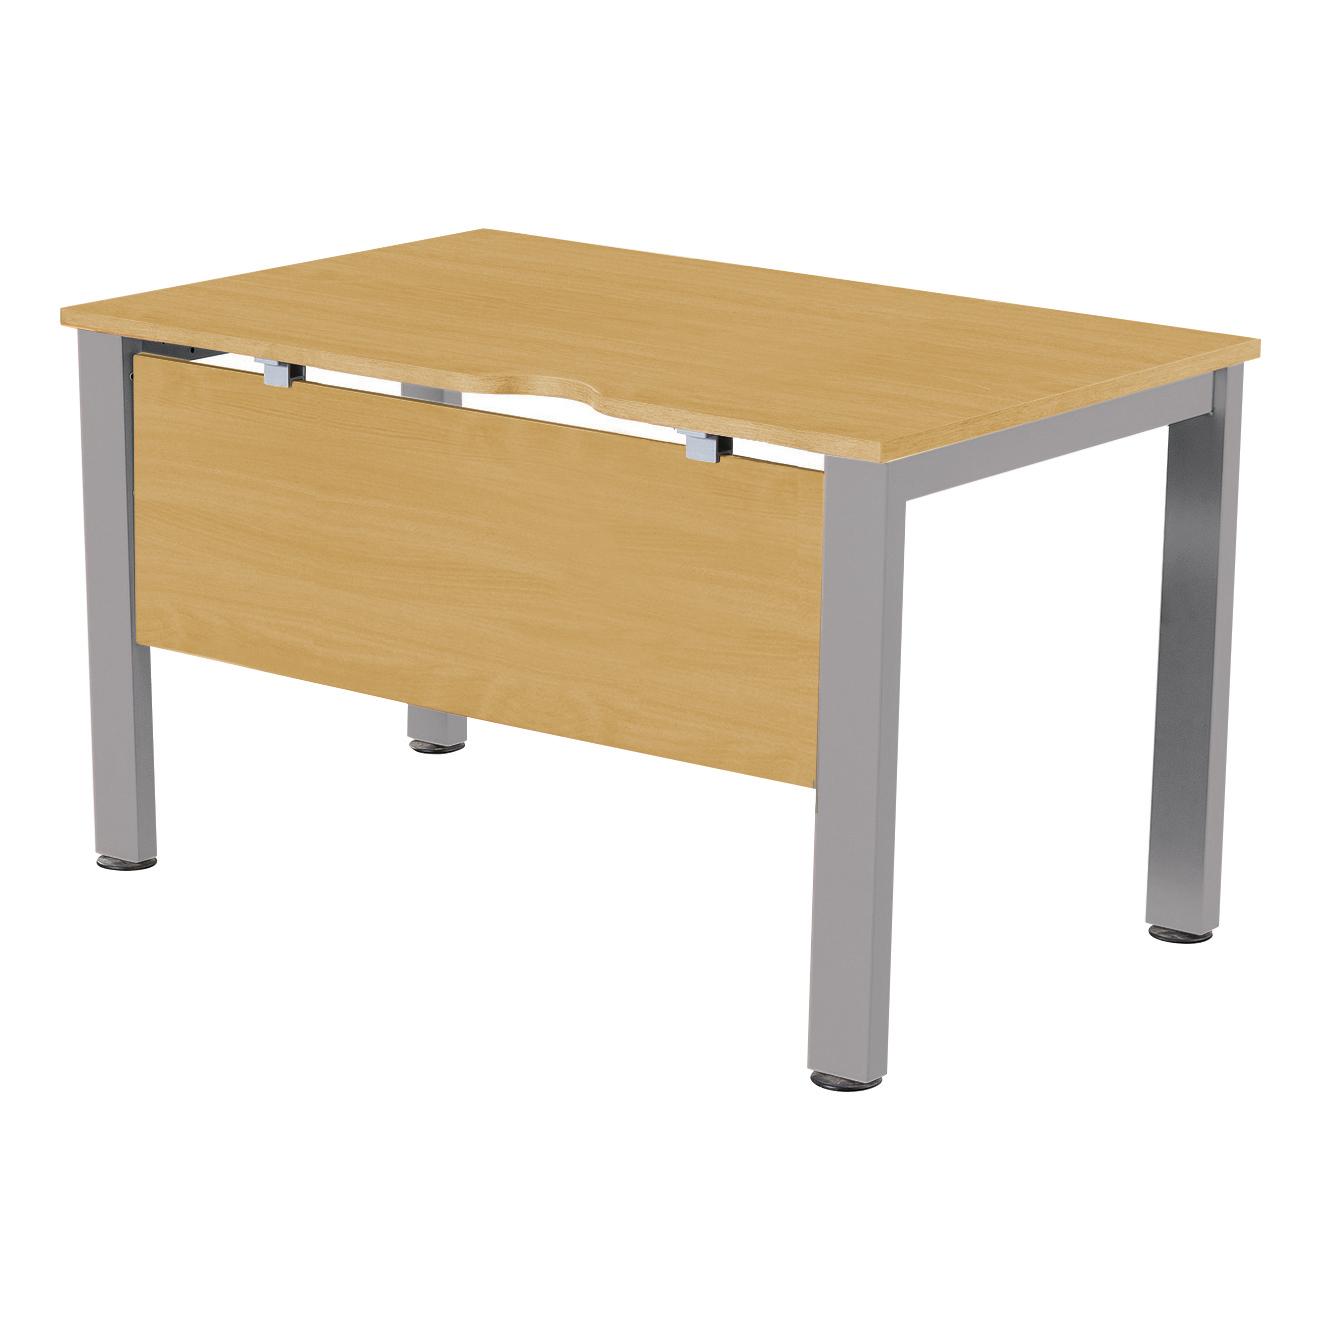 Sonix Standalone Desk Silver Legs 1000x800mm Natural Oak Ref fbcsmw10-1o